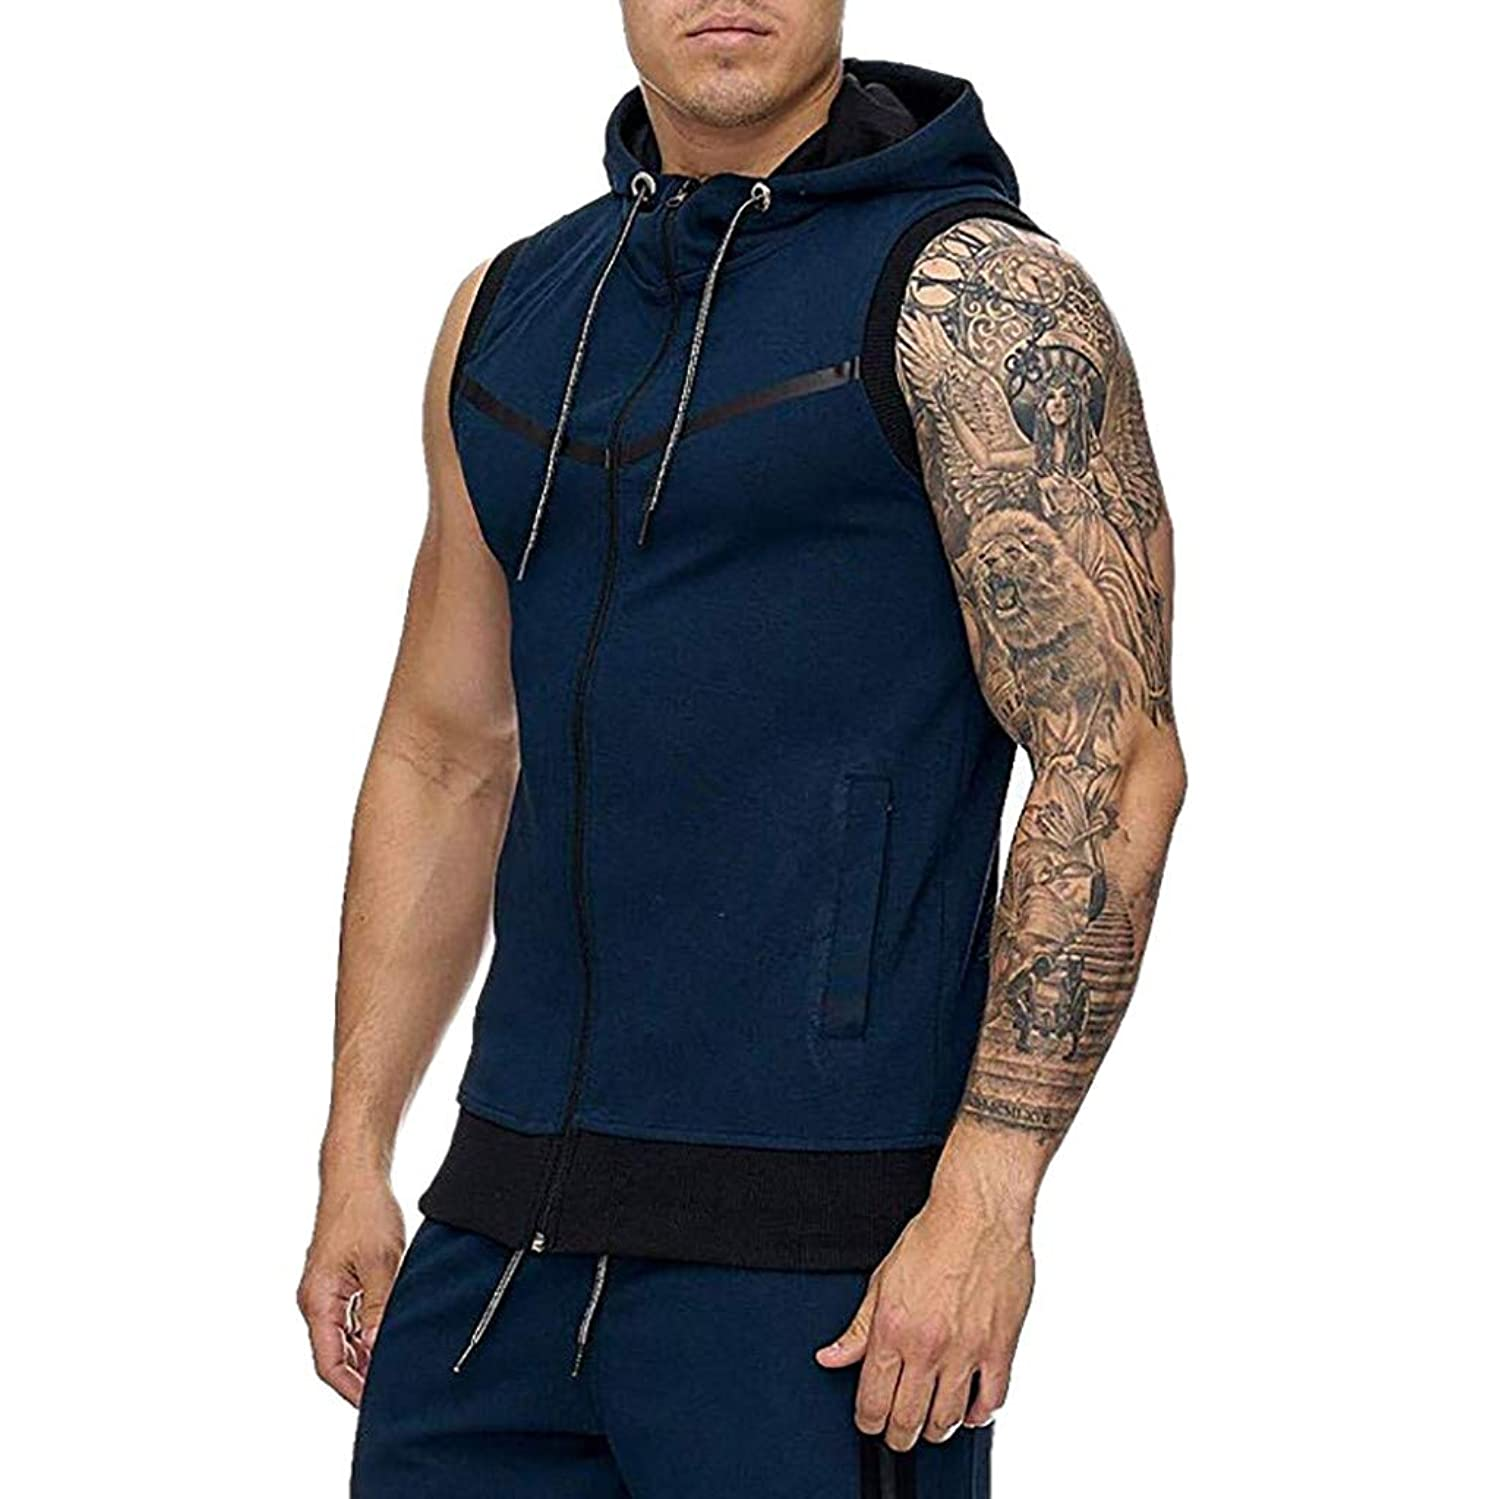 Forthery Men Sauna Sweat Vest Loss Waist Trainer Vest Zipper Workout Tank Top Shapewear